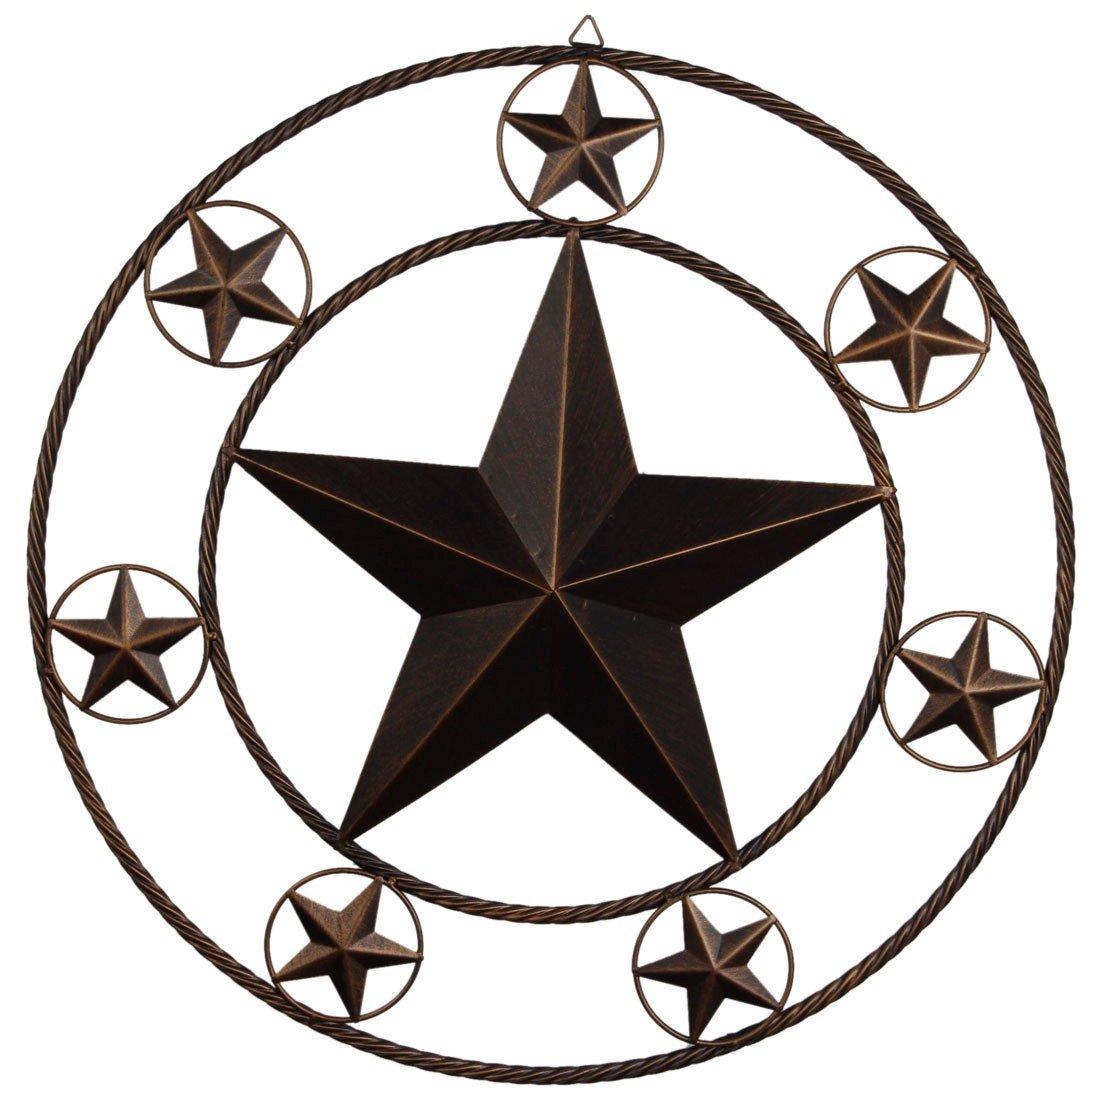 Ai.Moichien 26'' Vintage Dark Brown Home Metal Circled Star Wall Decor for Retro Style Living Room/Office/Bar/Restaurant Decoration